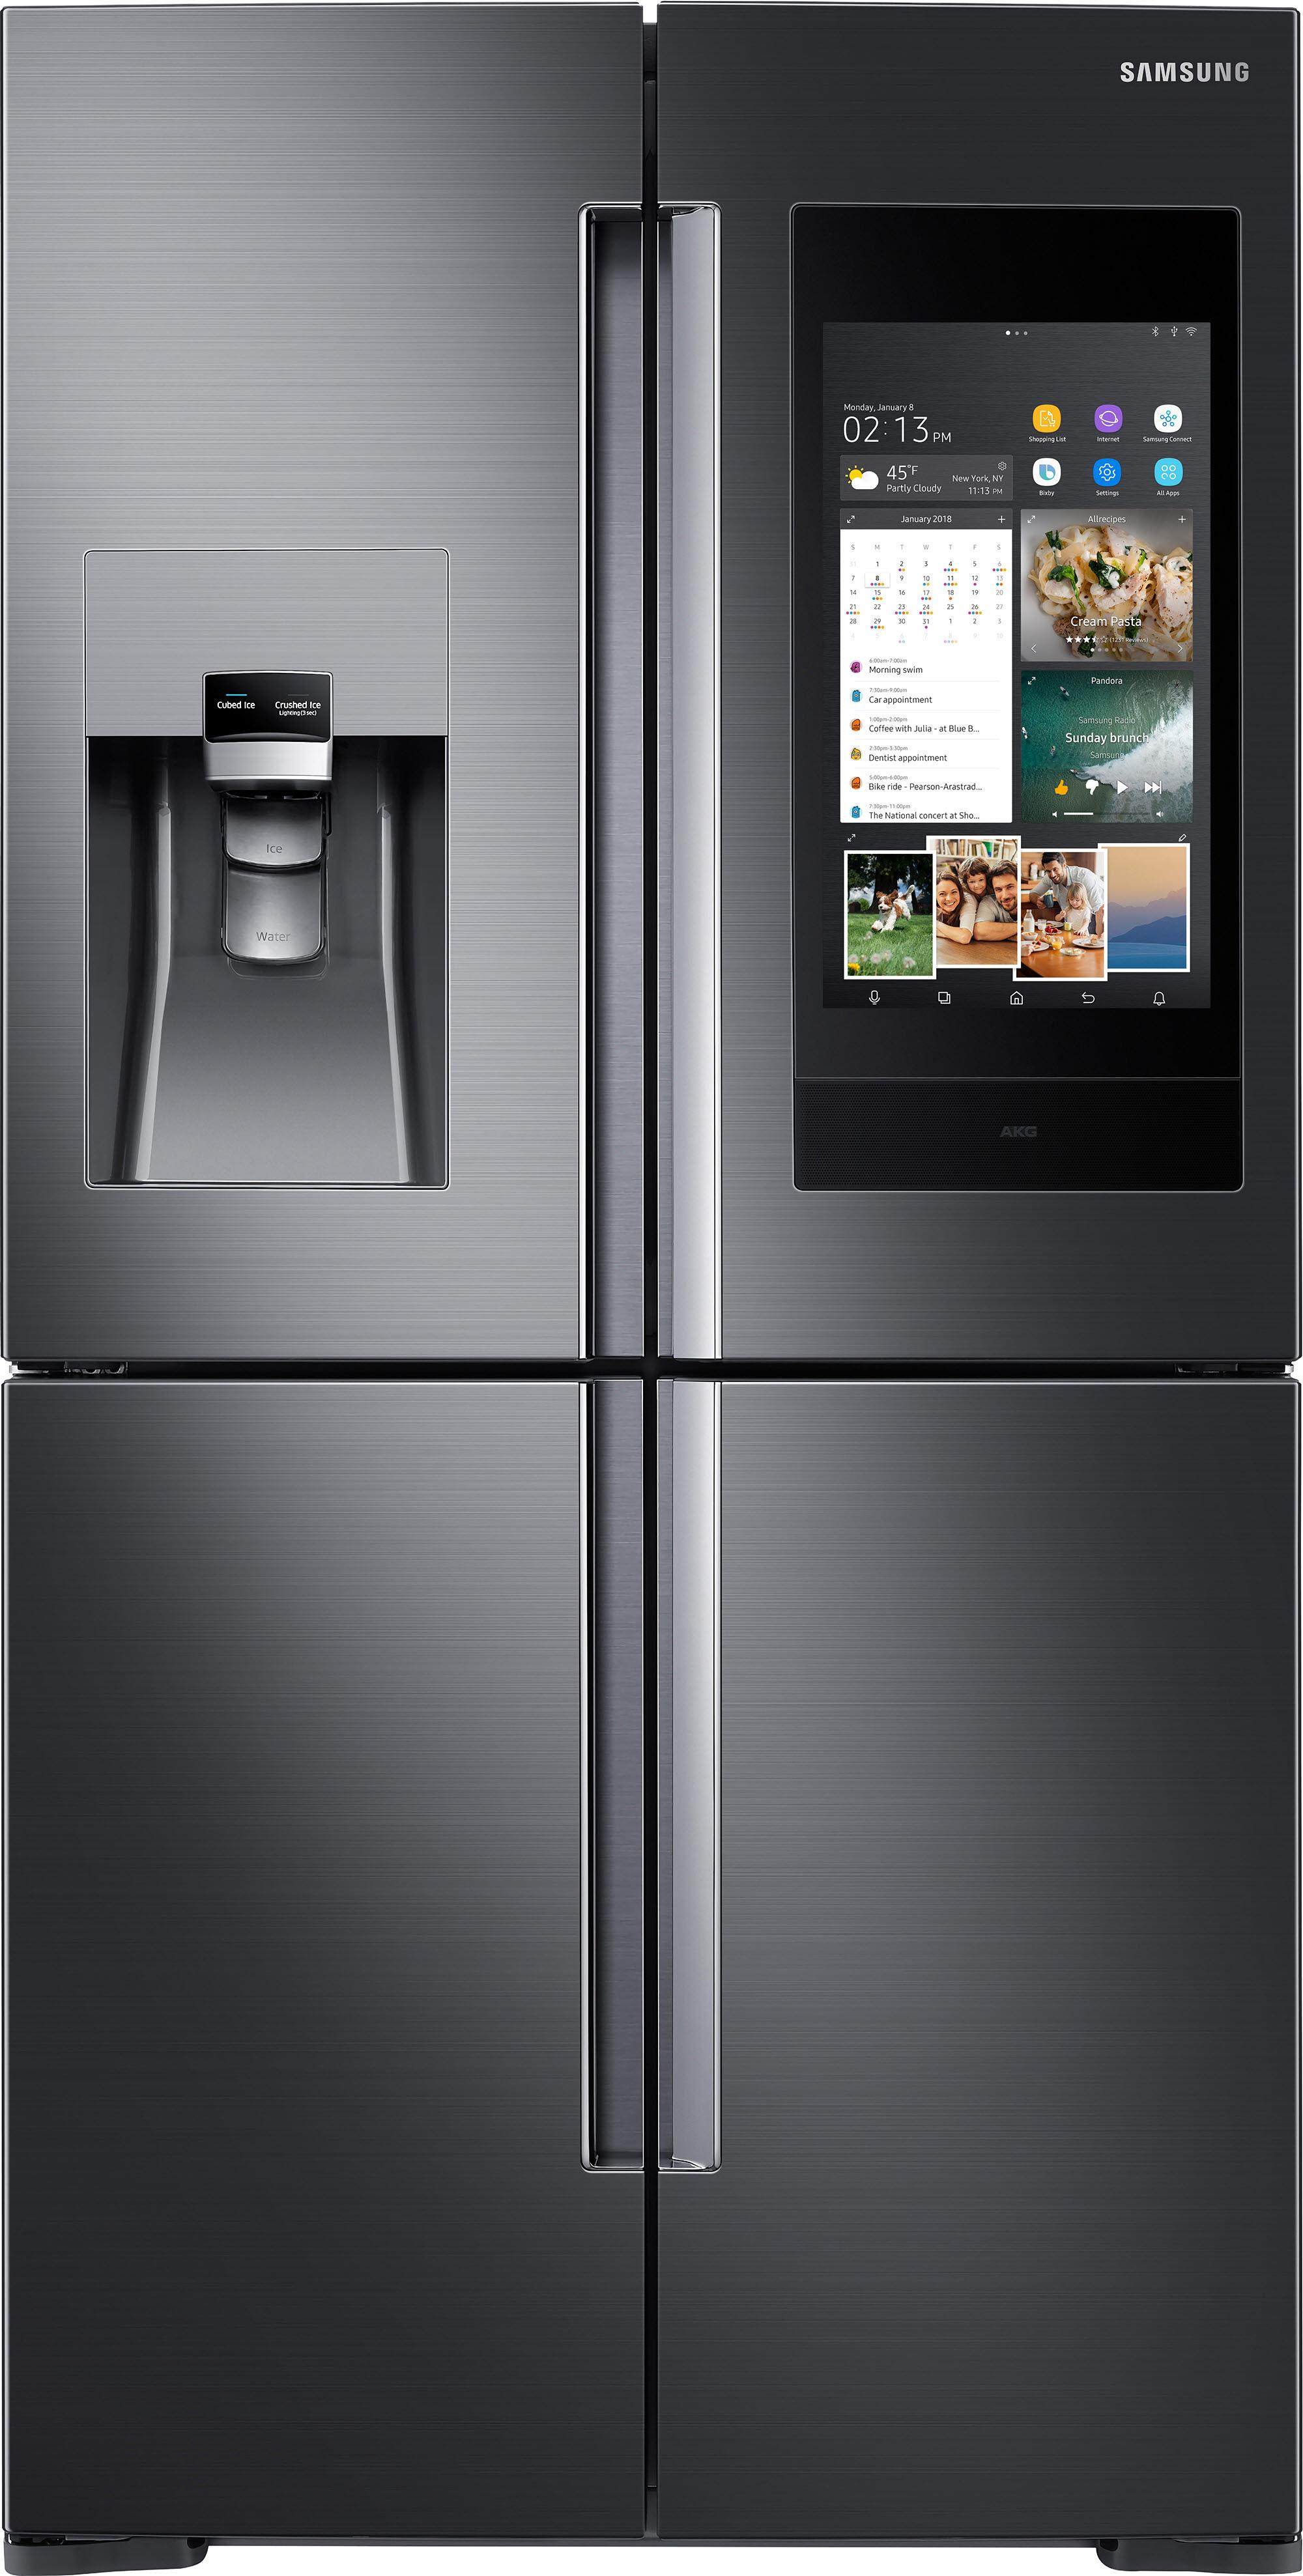 Samsung Electronics Debuts Next Generation Of Family Hub